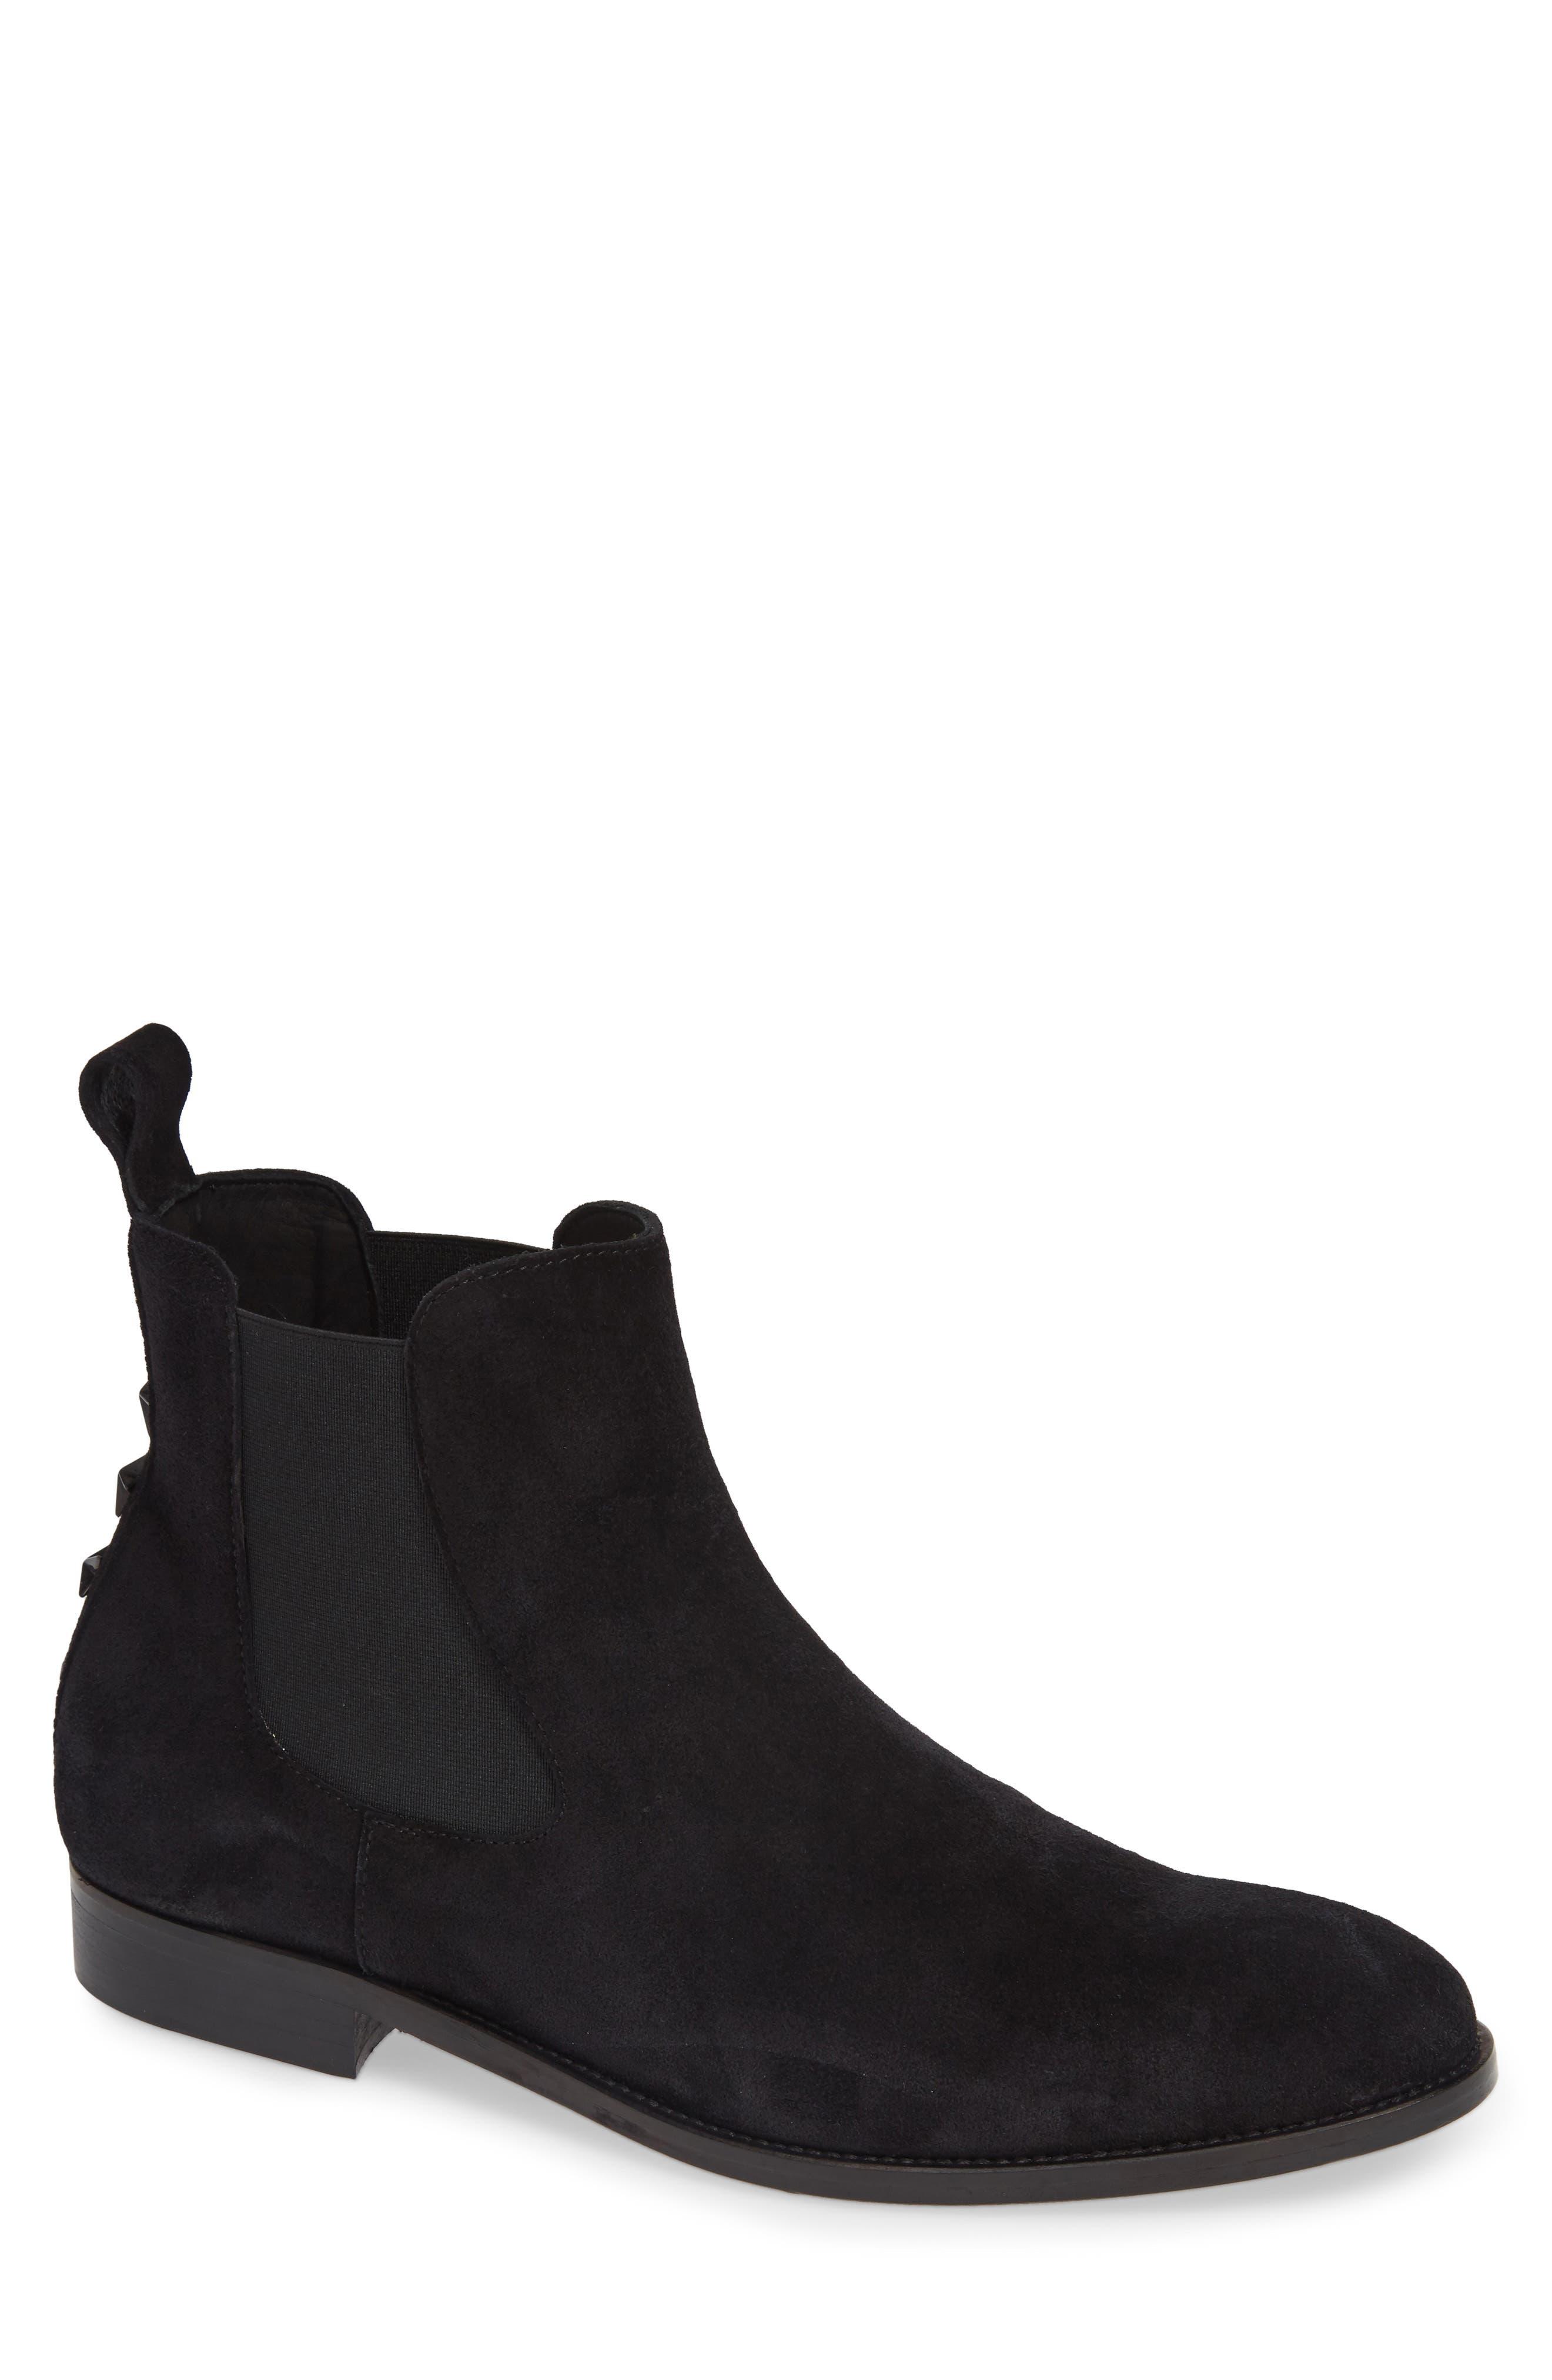 Como Chelsea Boot,                         Main,                         color, BLACK